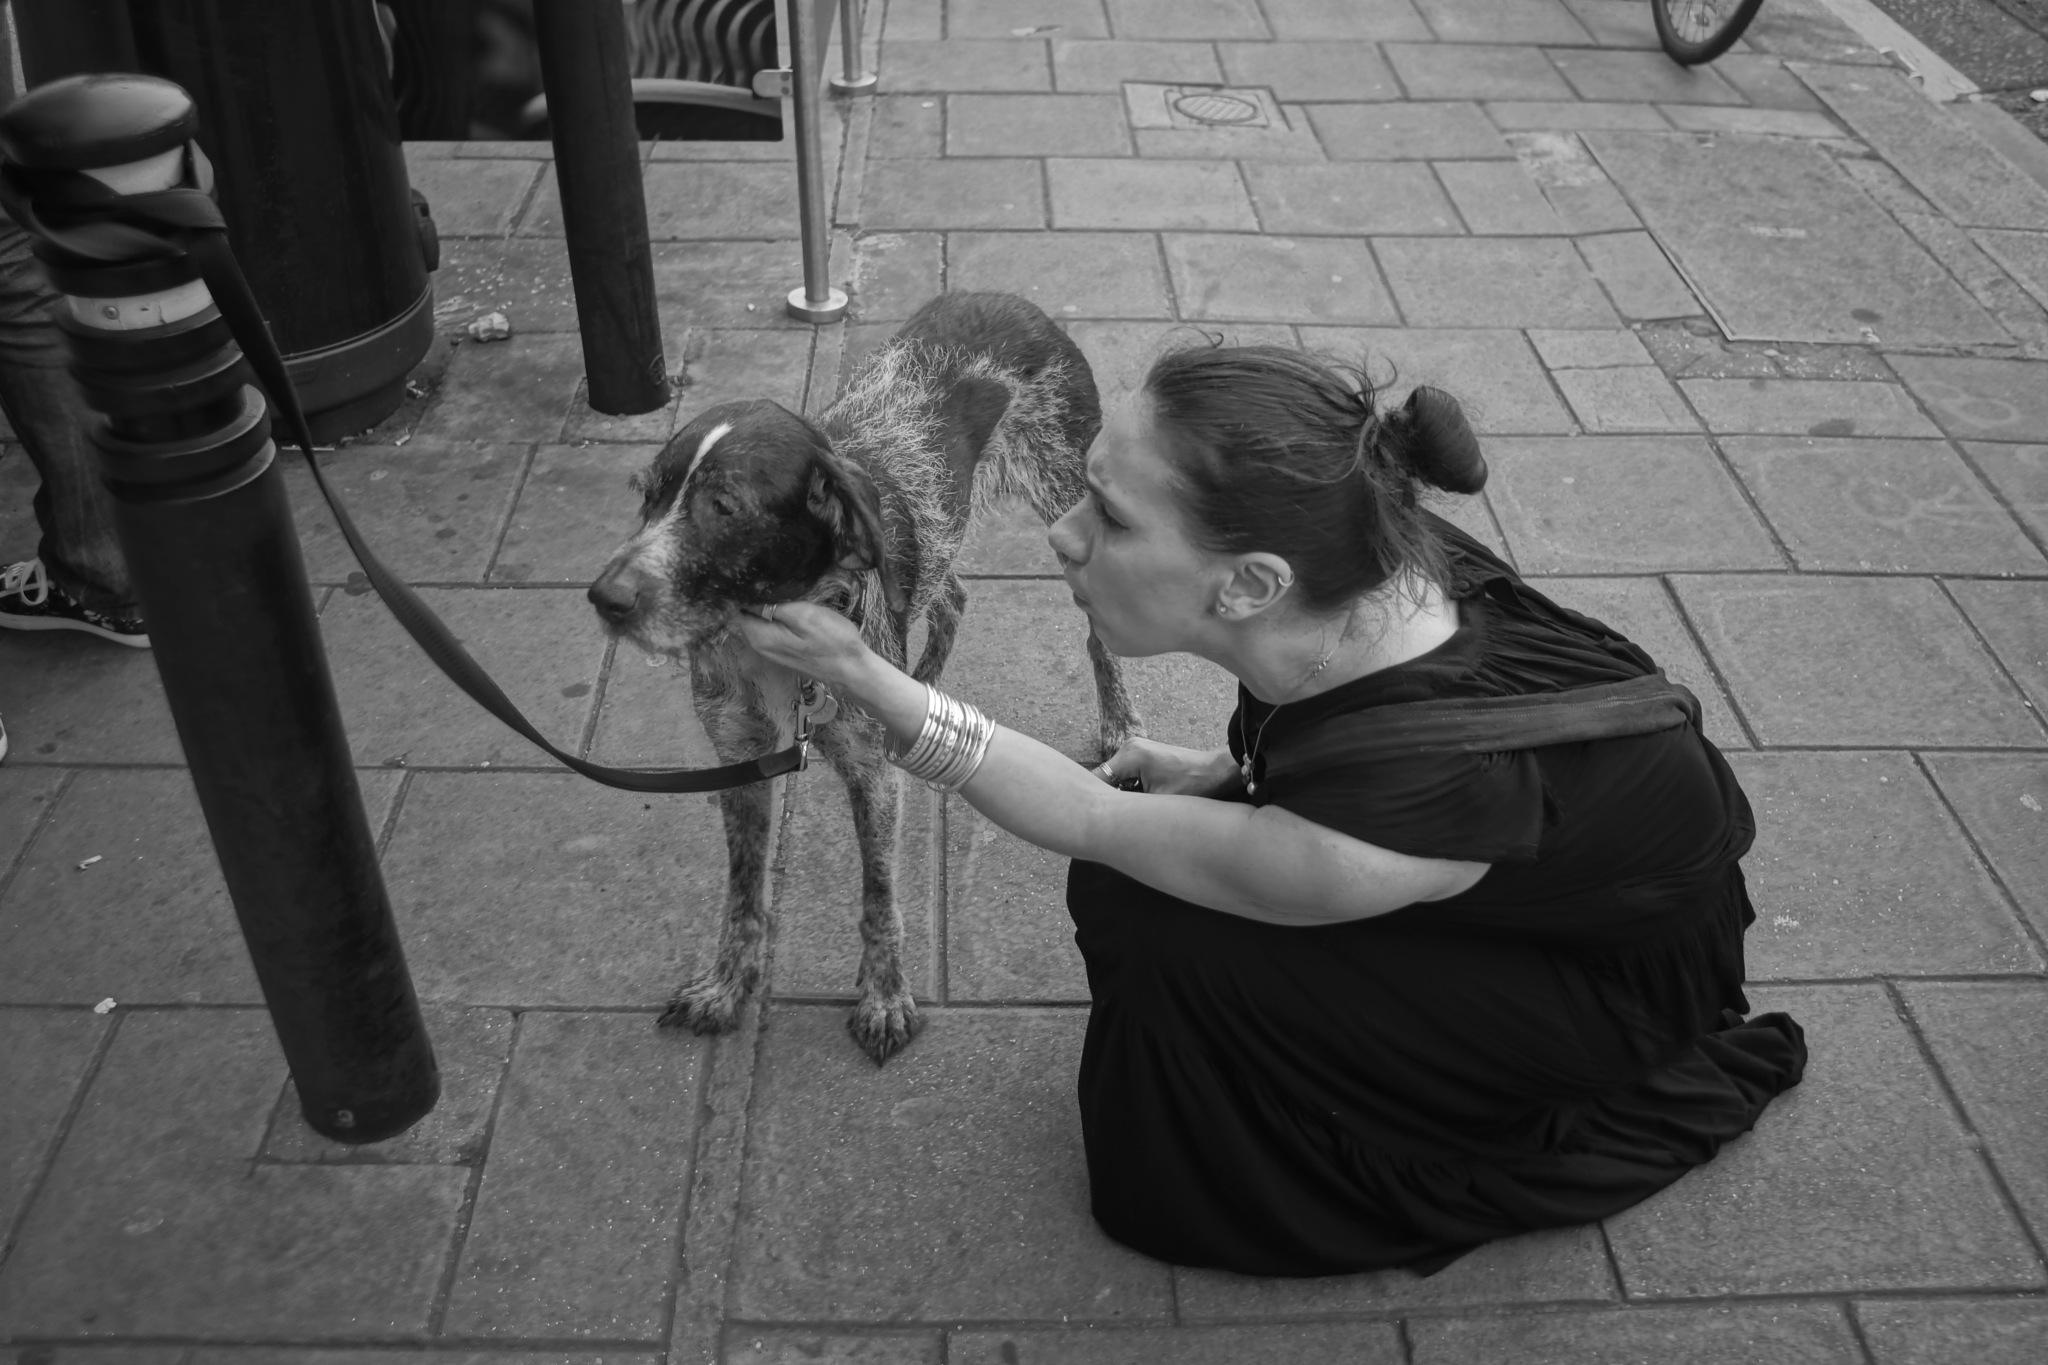 Pet the dog by erol.antz